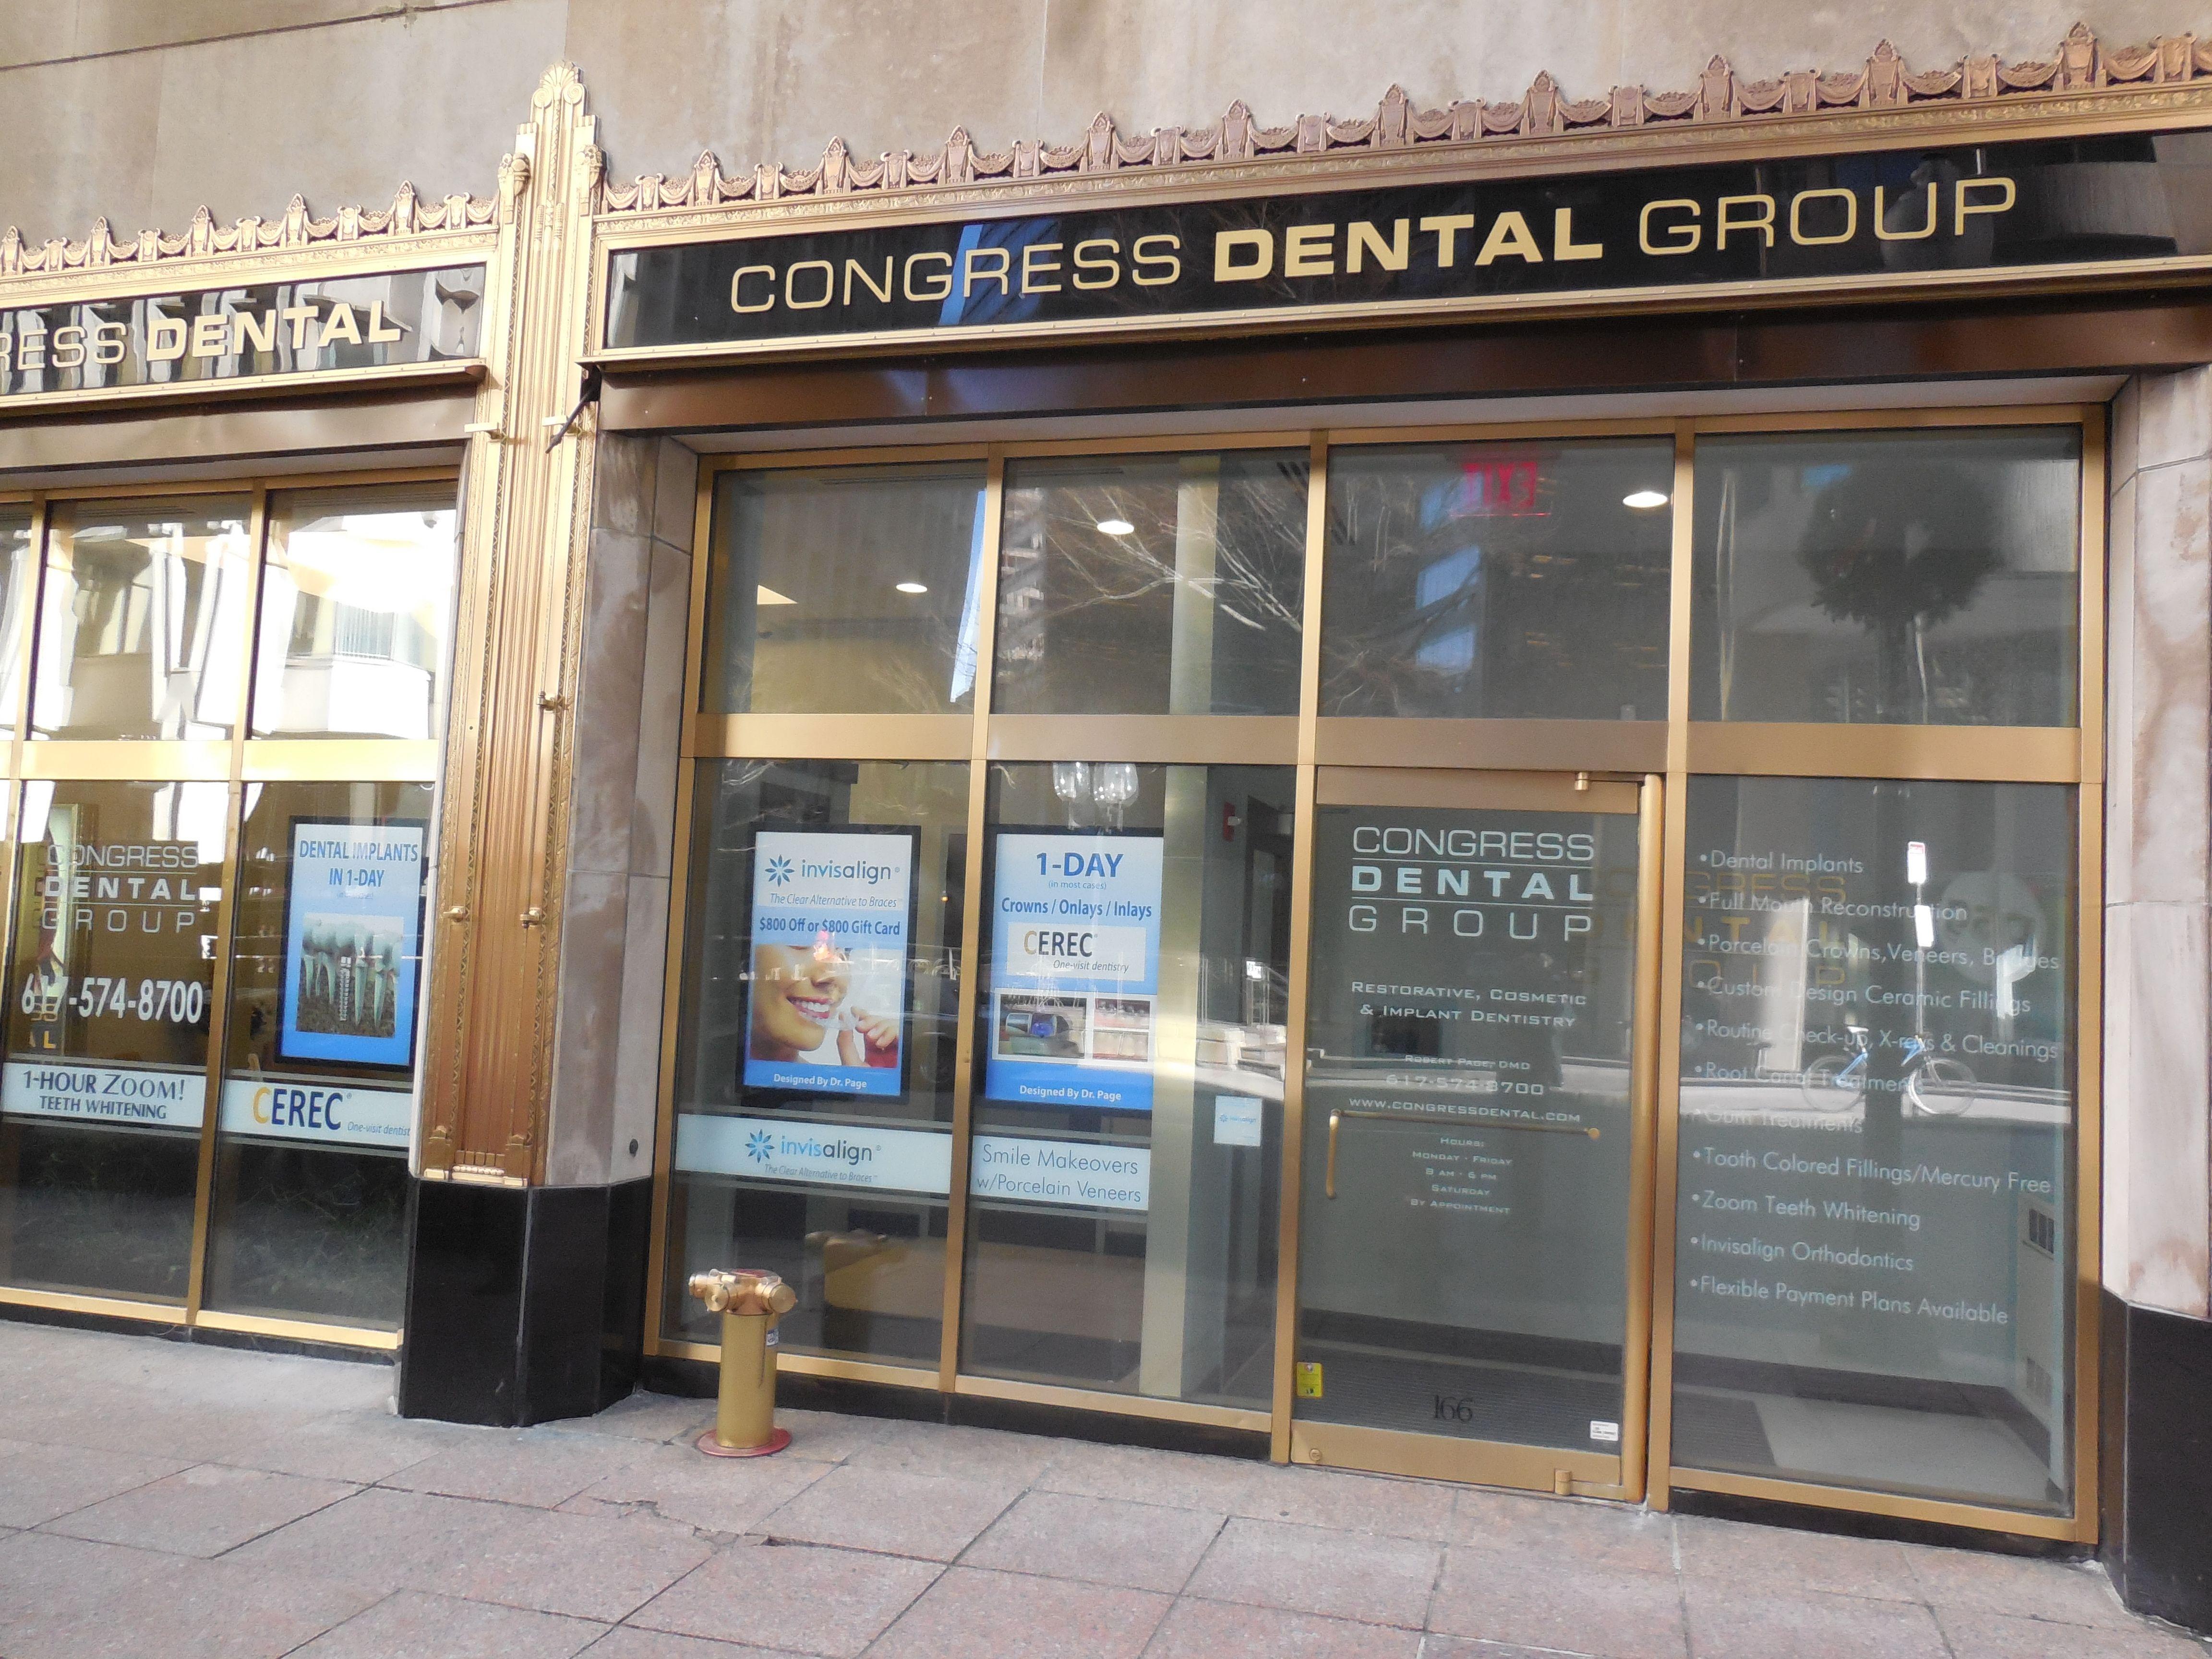 Congress Dental Group 160 Federal St Boston, MA 02110. Phone: (617) 574-8700 http://congressdentalgroup.com